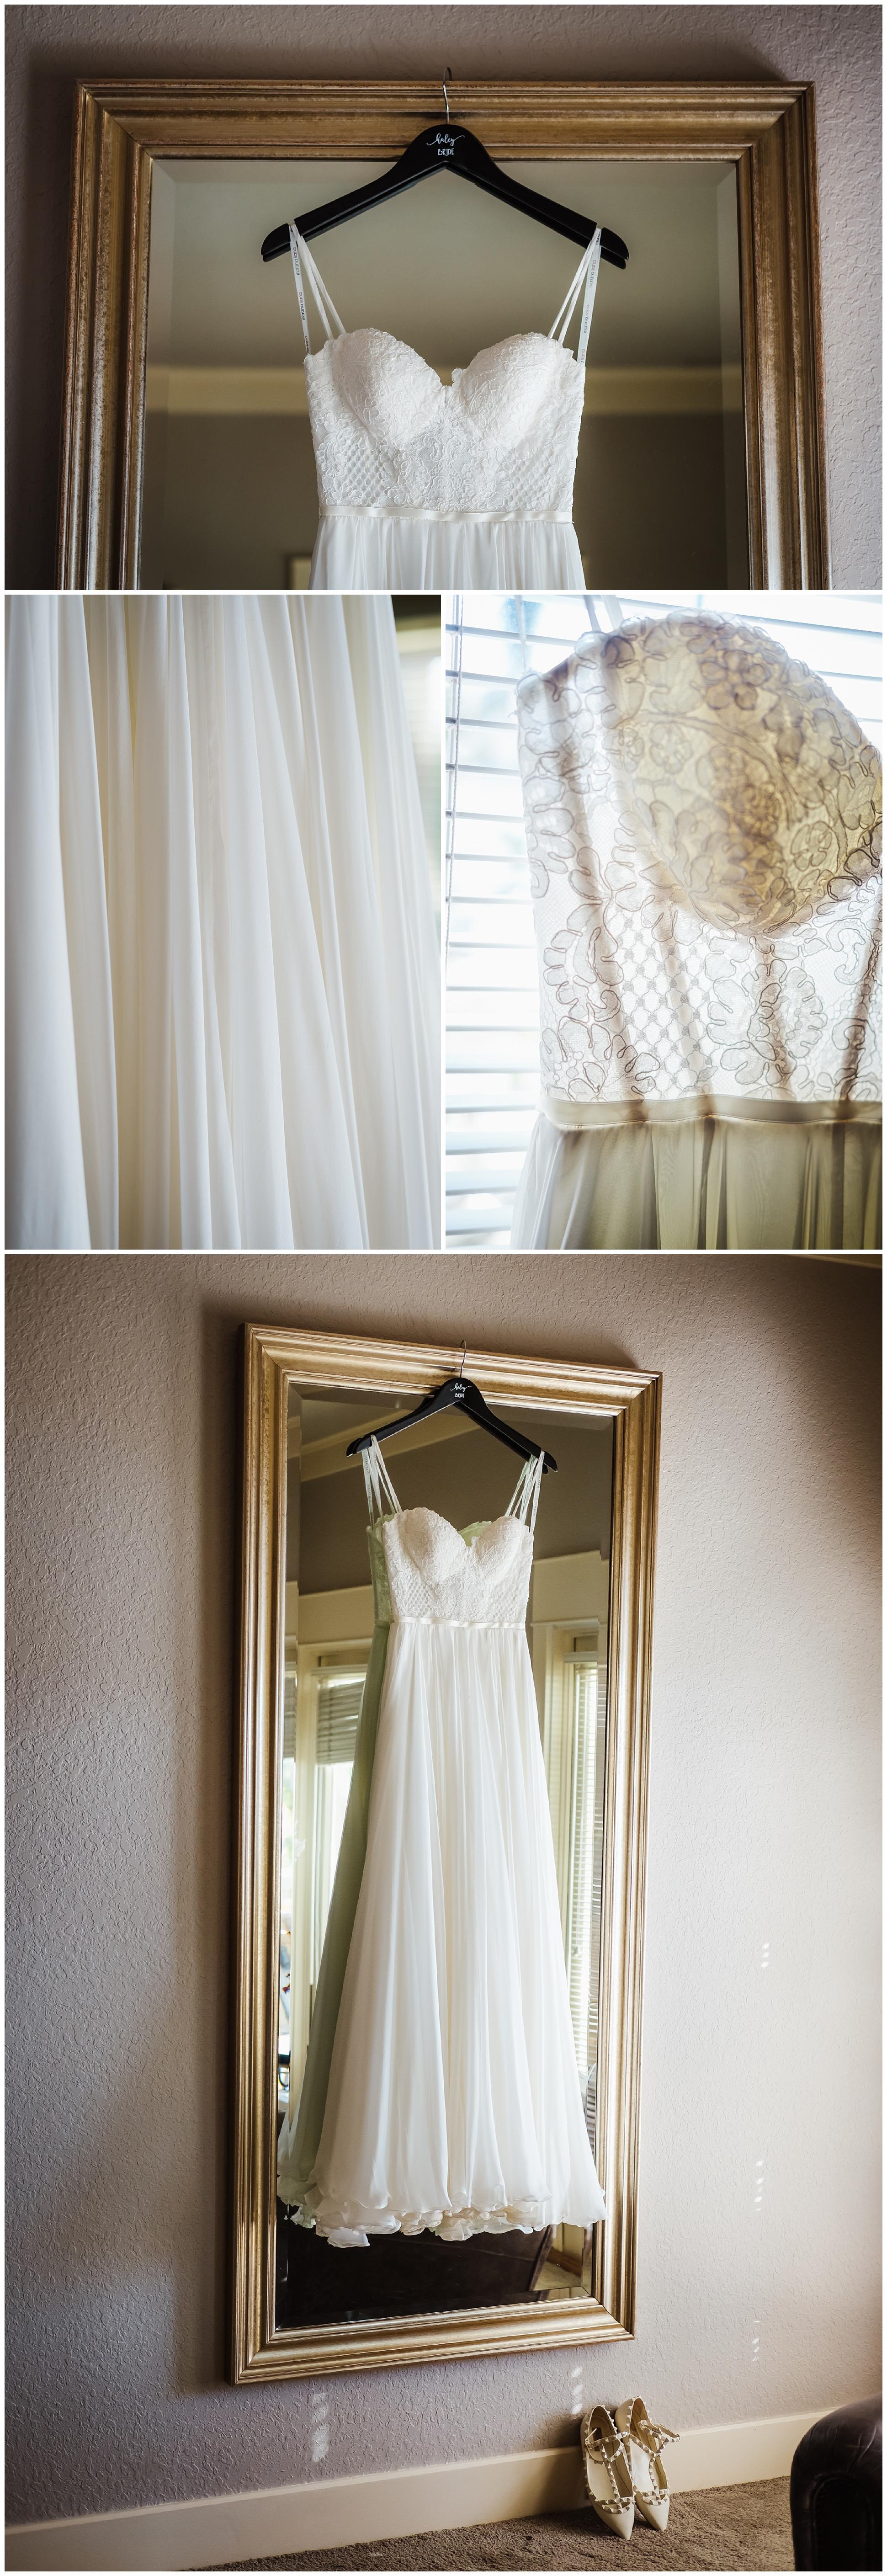 st-pete-wedding-photographer-backyard-luxury-snell-isle-vinoy_0004.jpg